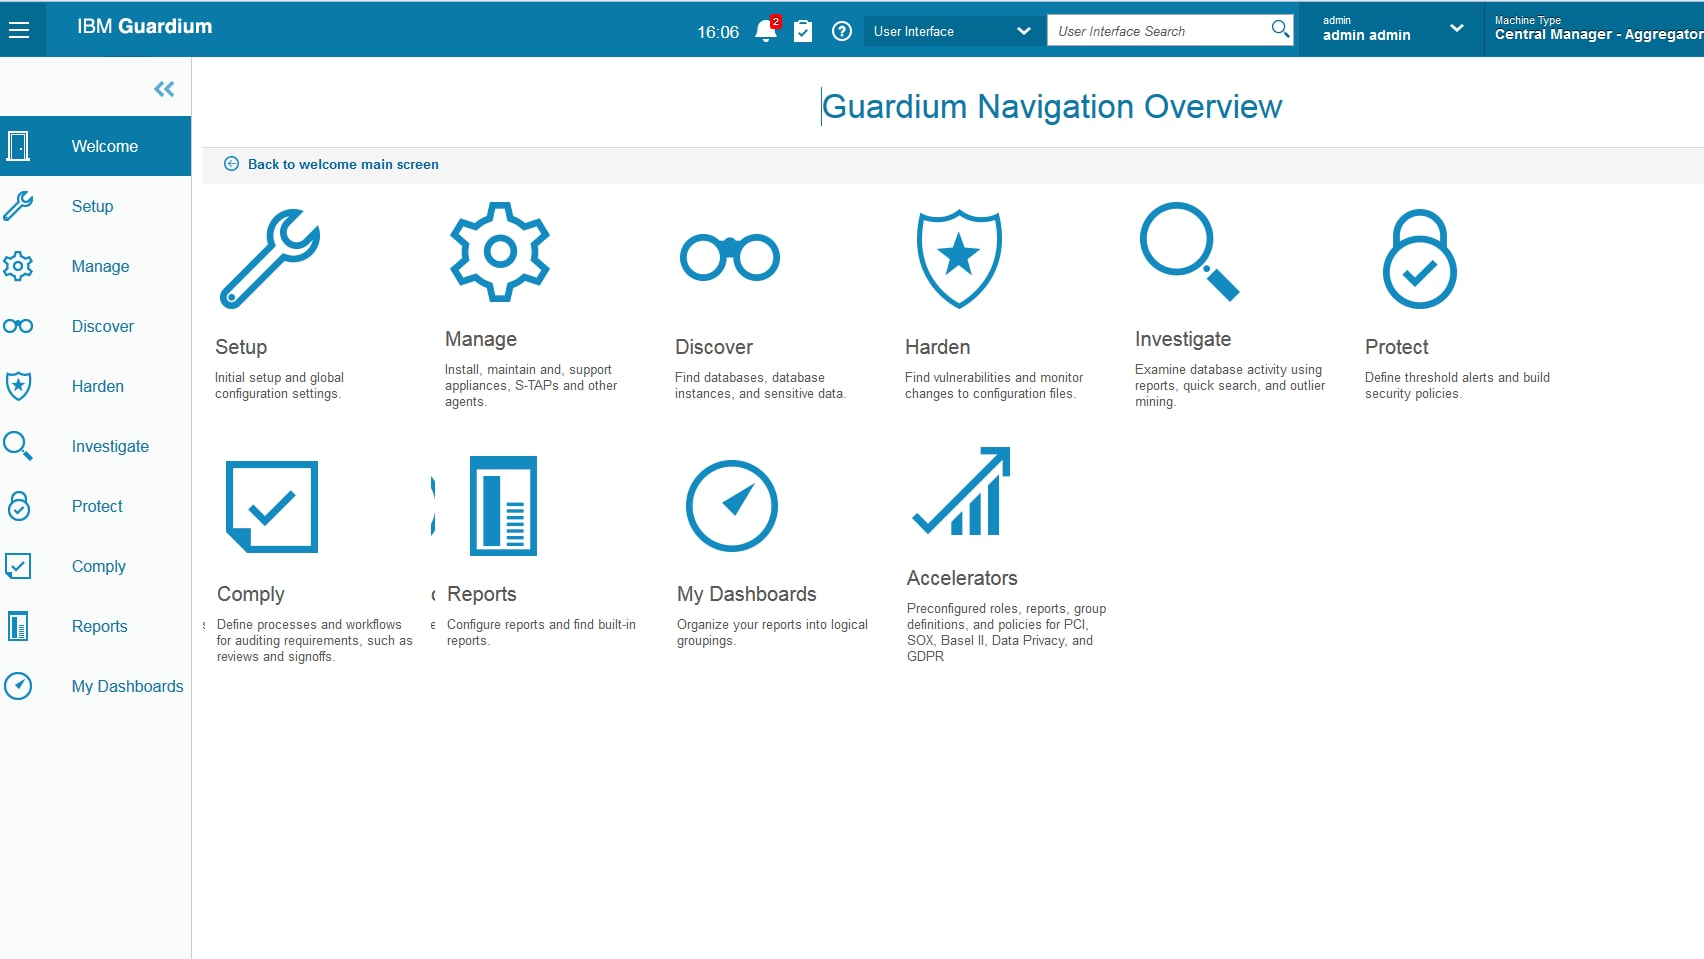 Guardium navigation overview